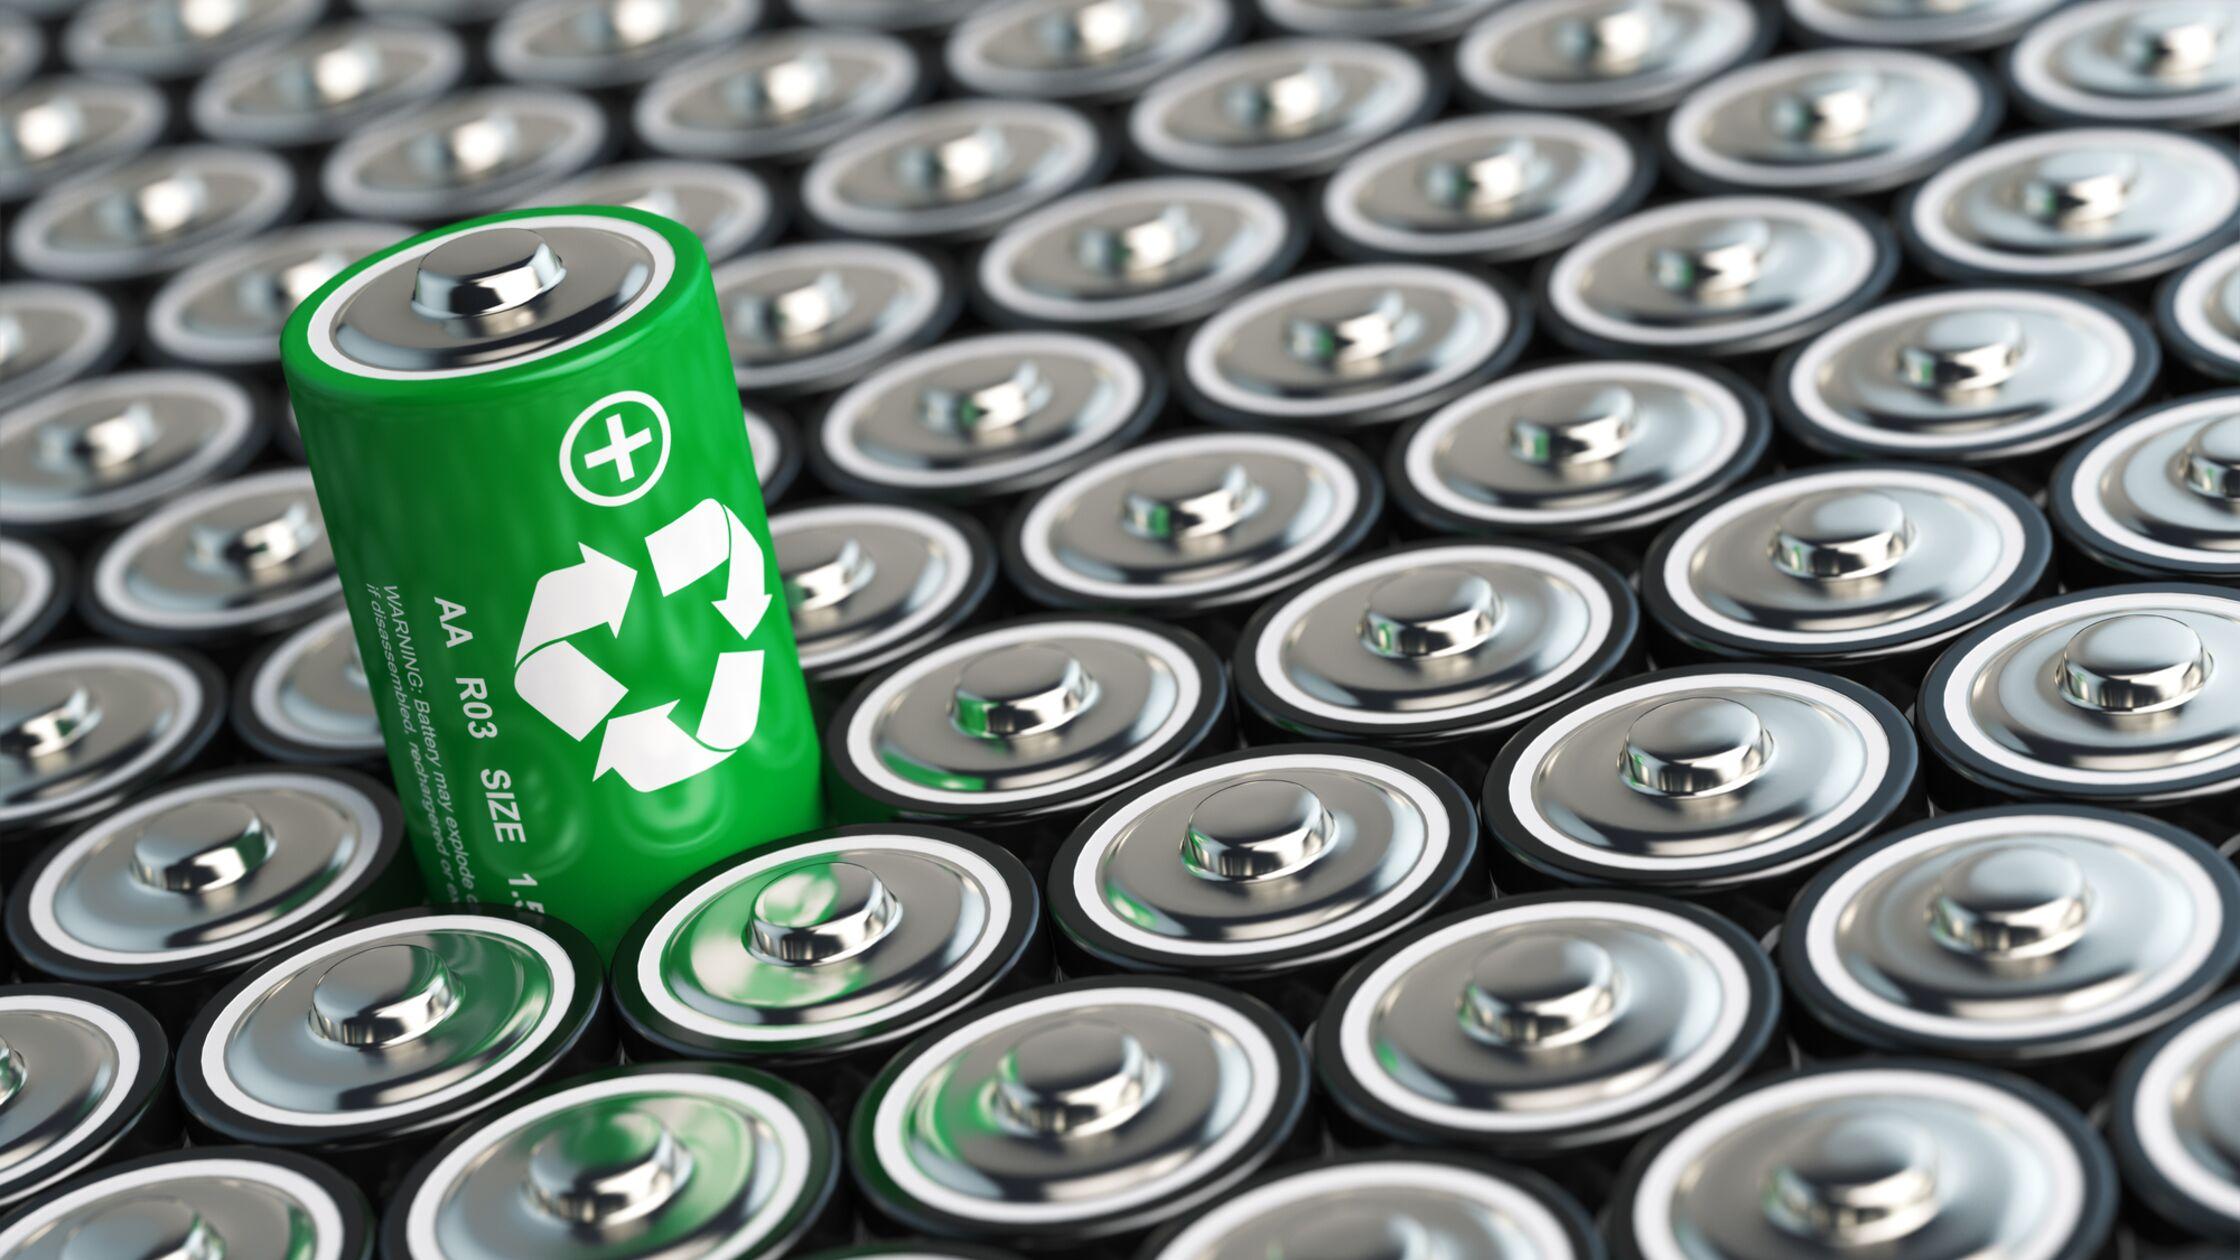 Sondermüll: So entsorgen Sie Altöl, Batterien, Farbe & Co richtig